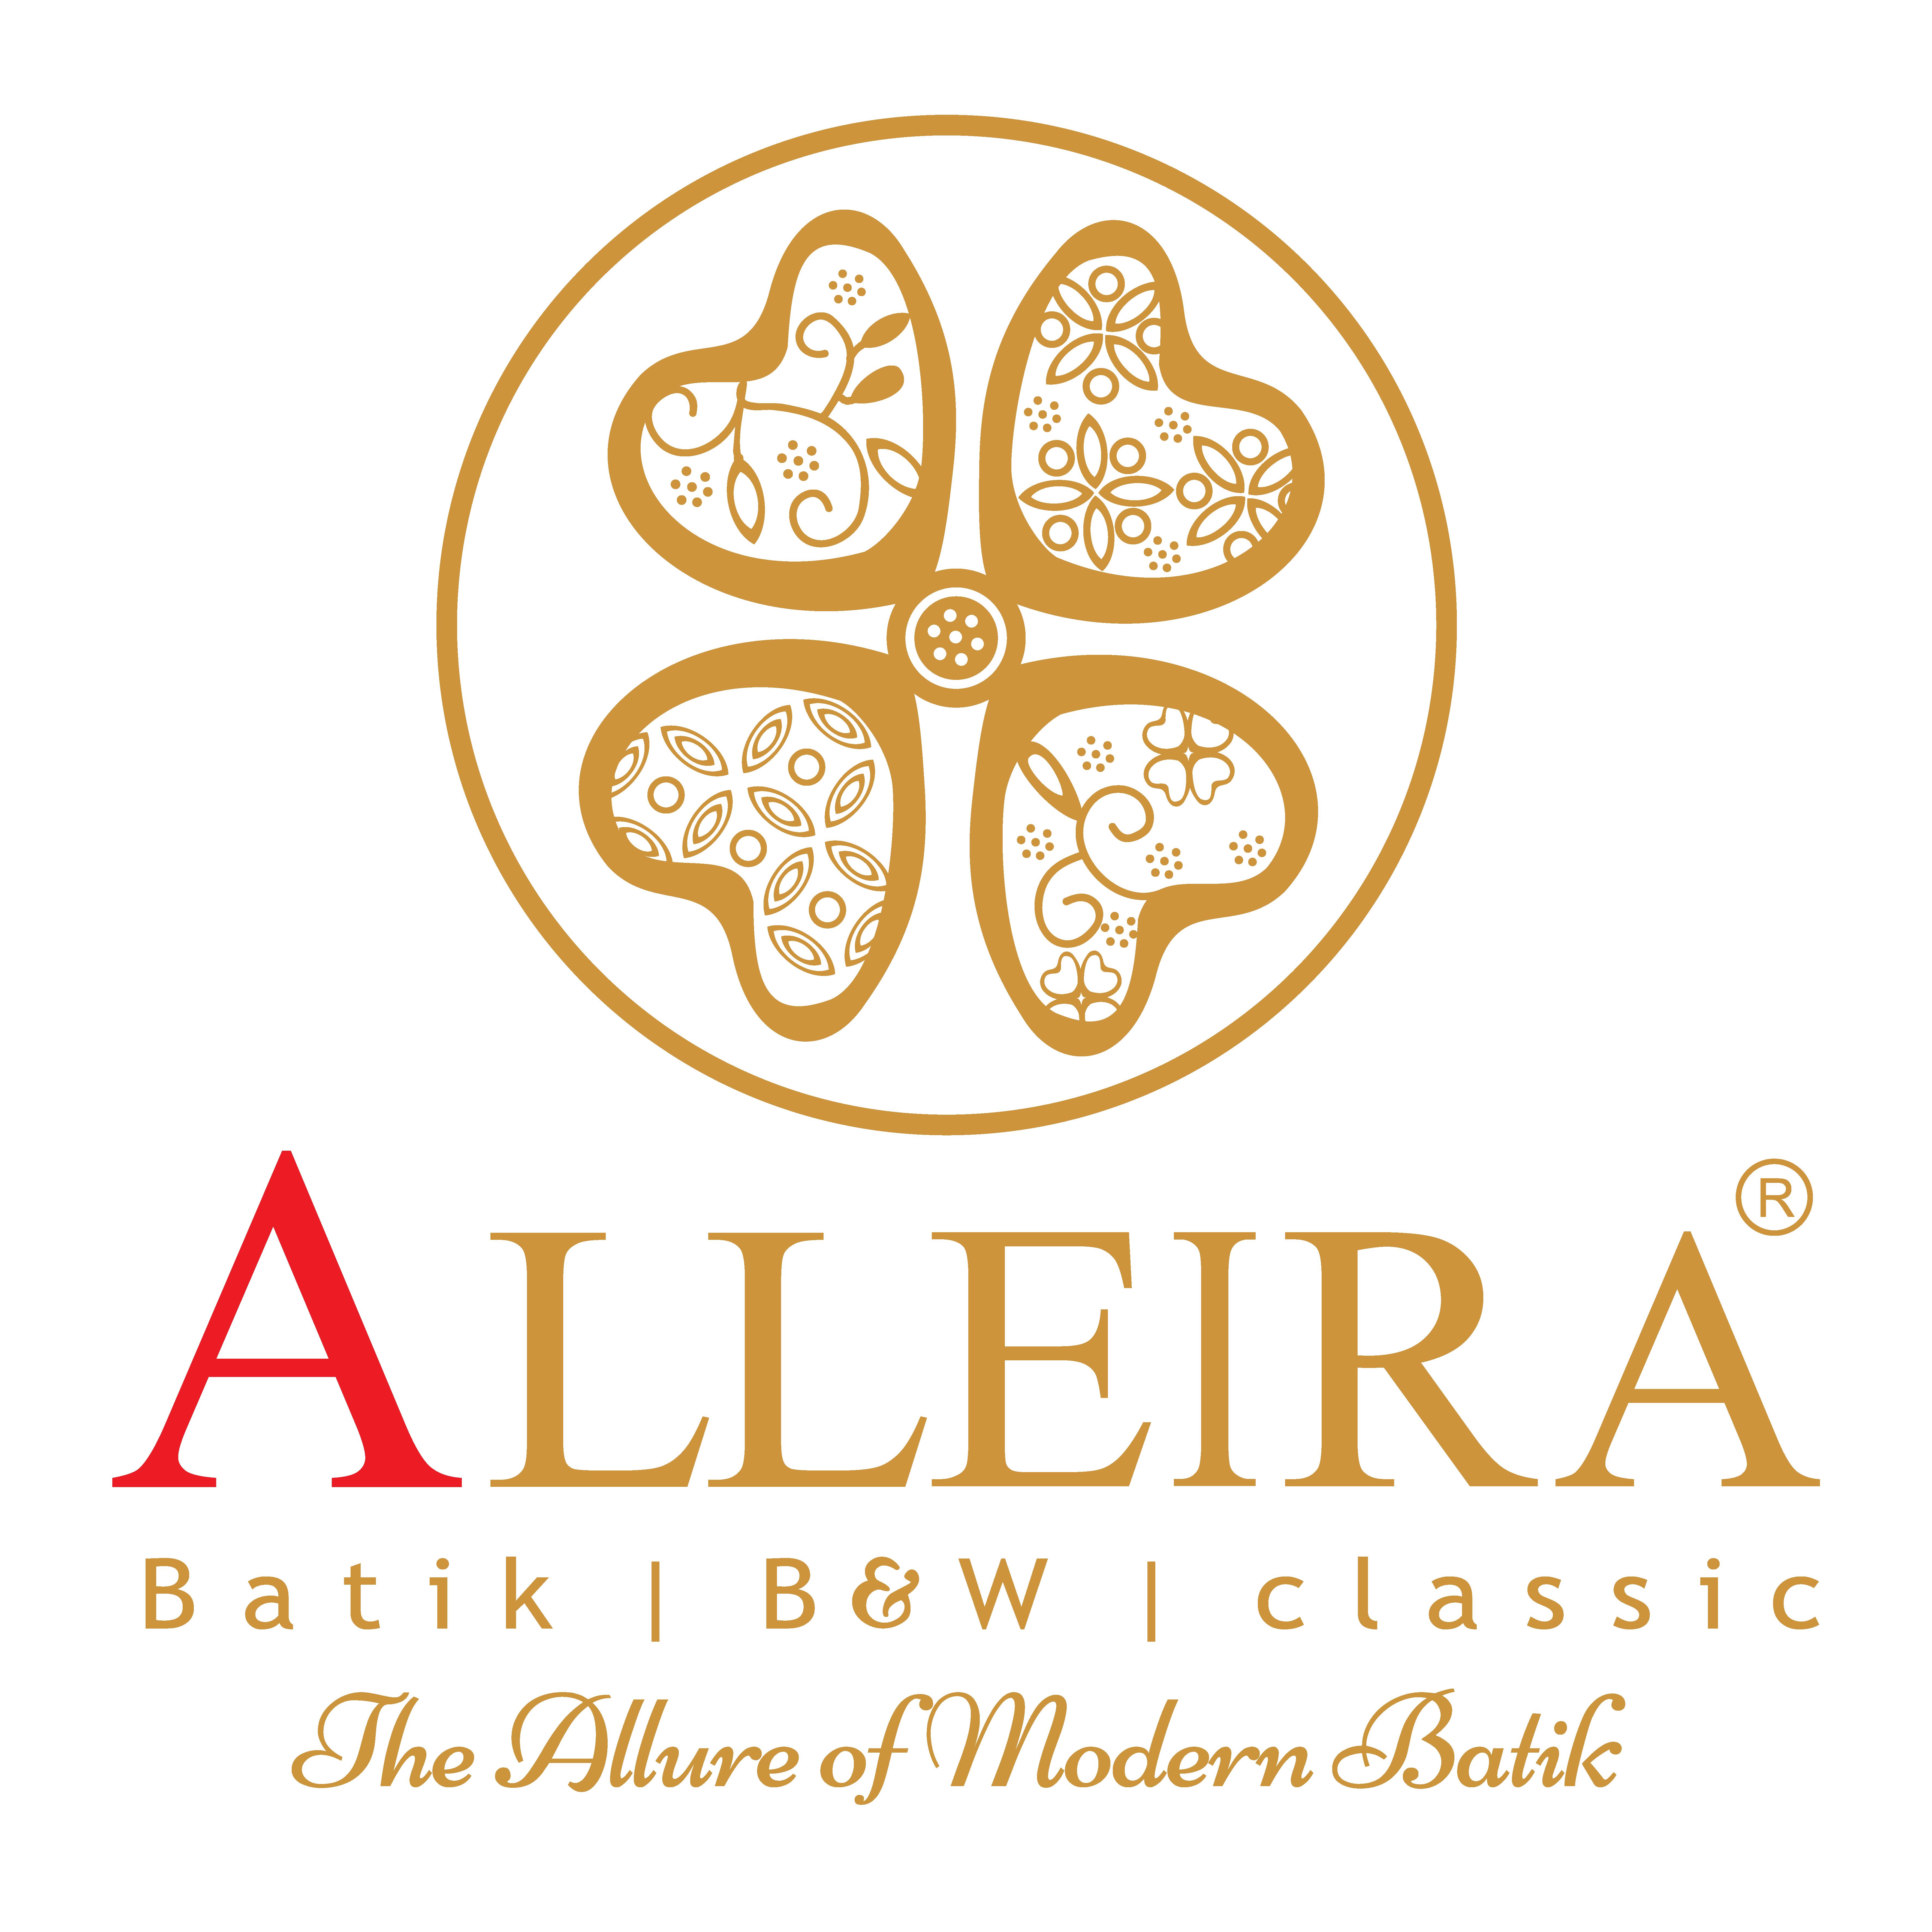 image of alleira batik